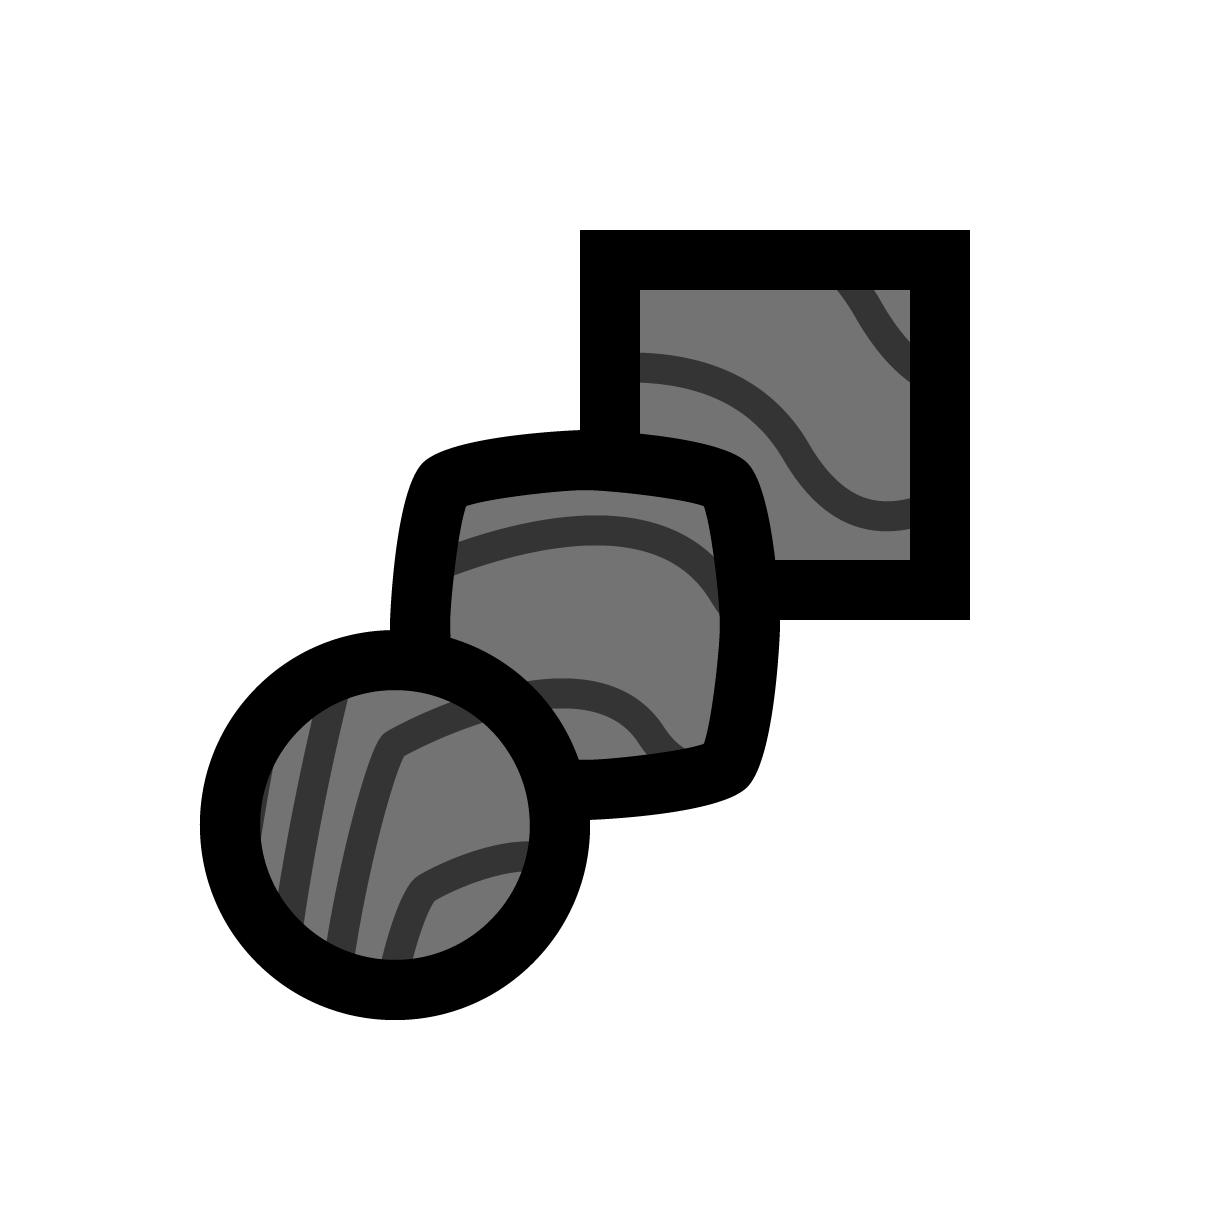 atlas_icon_animation-01